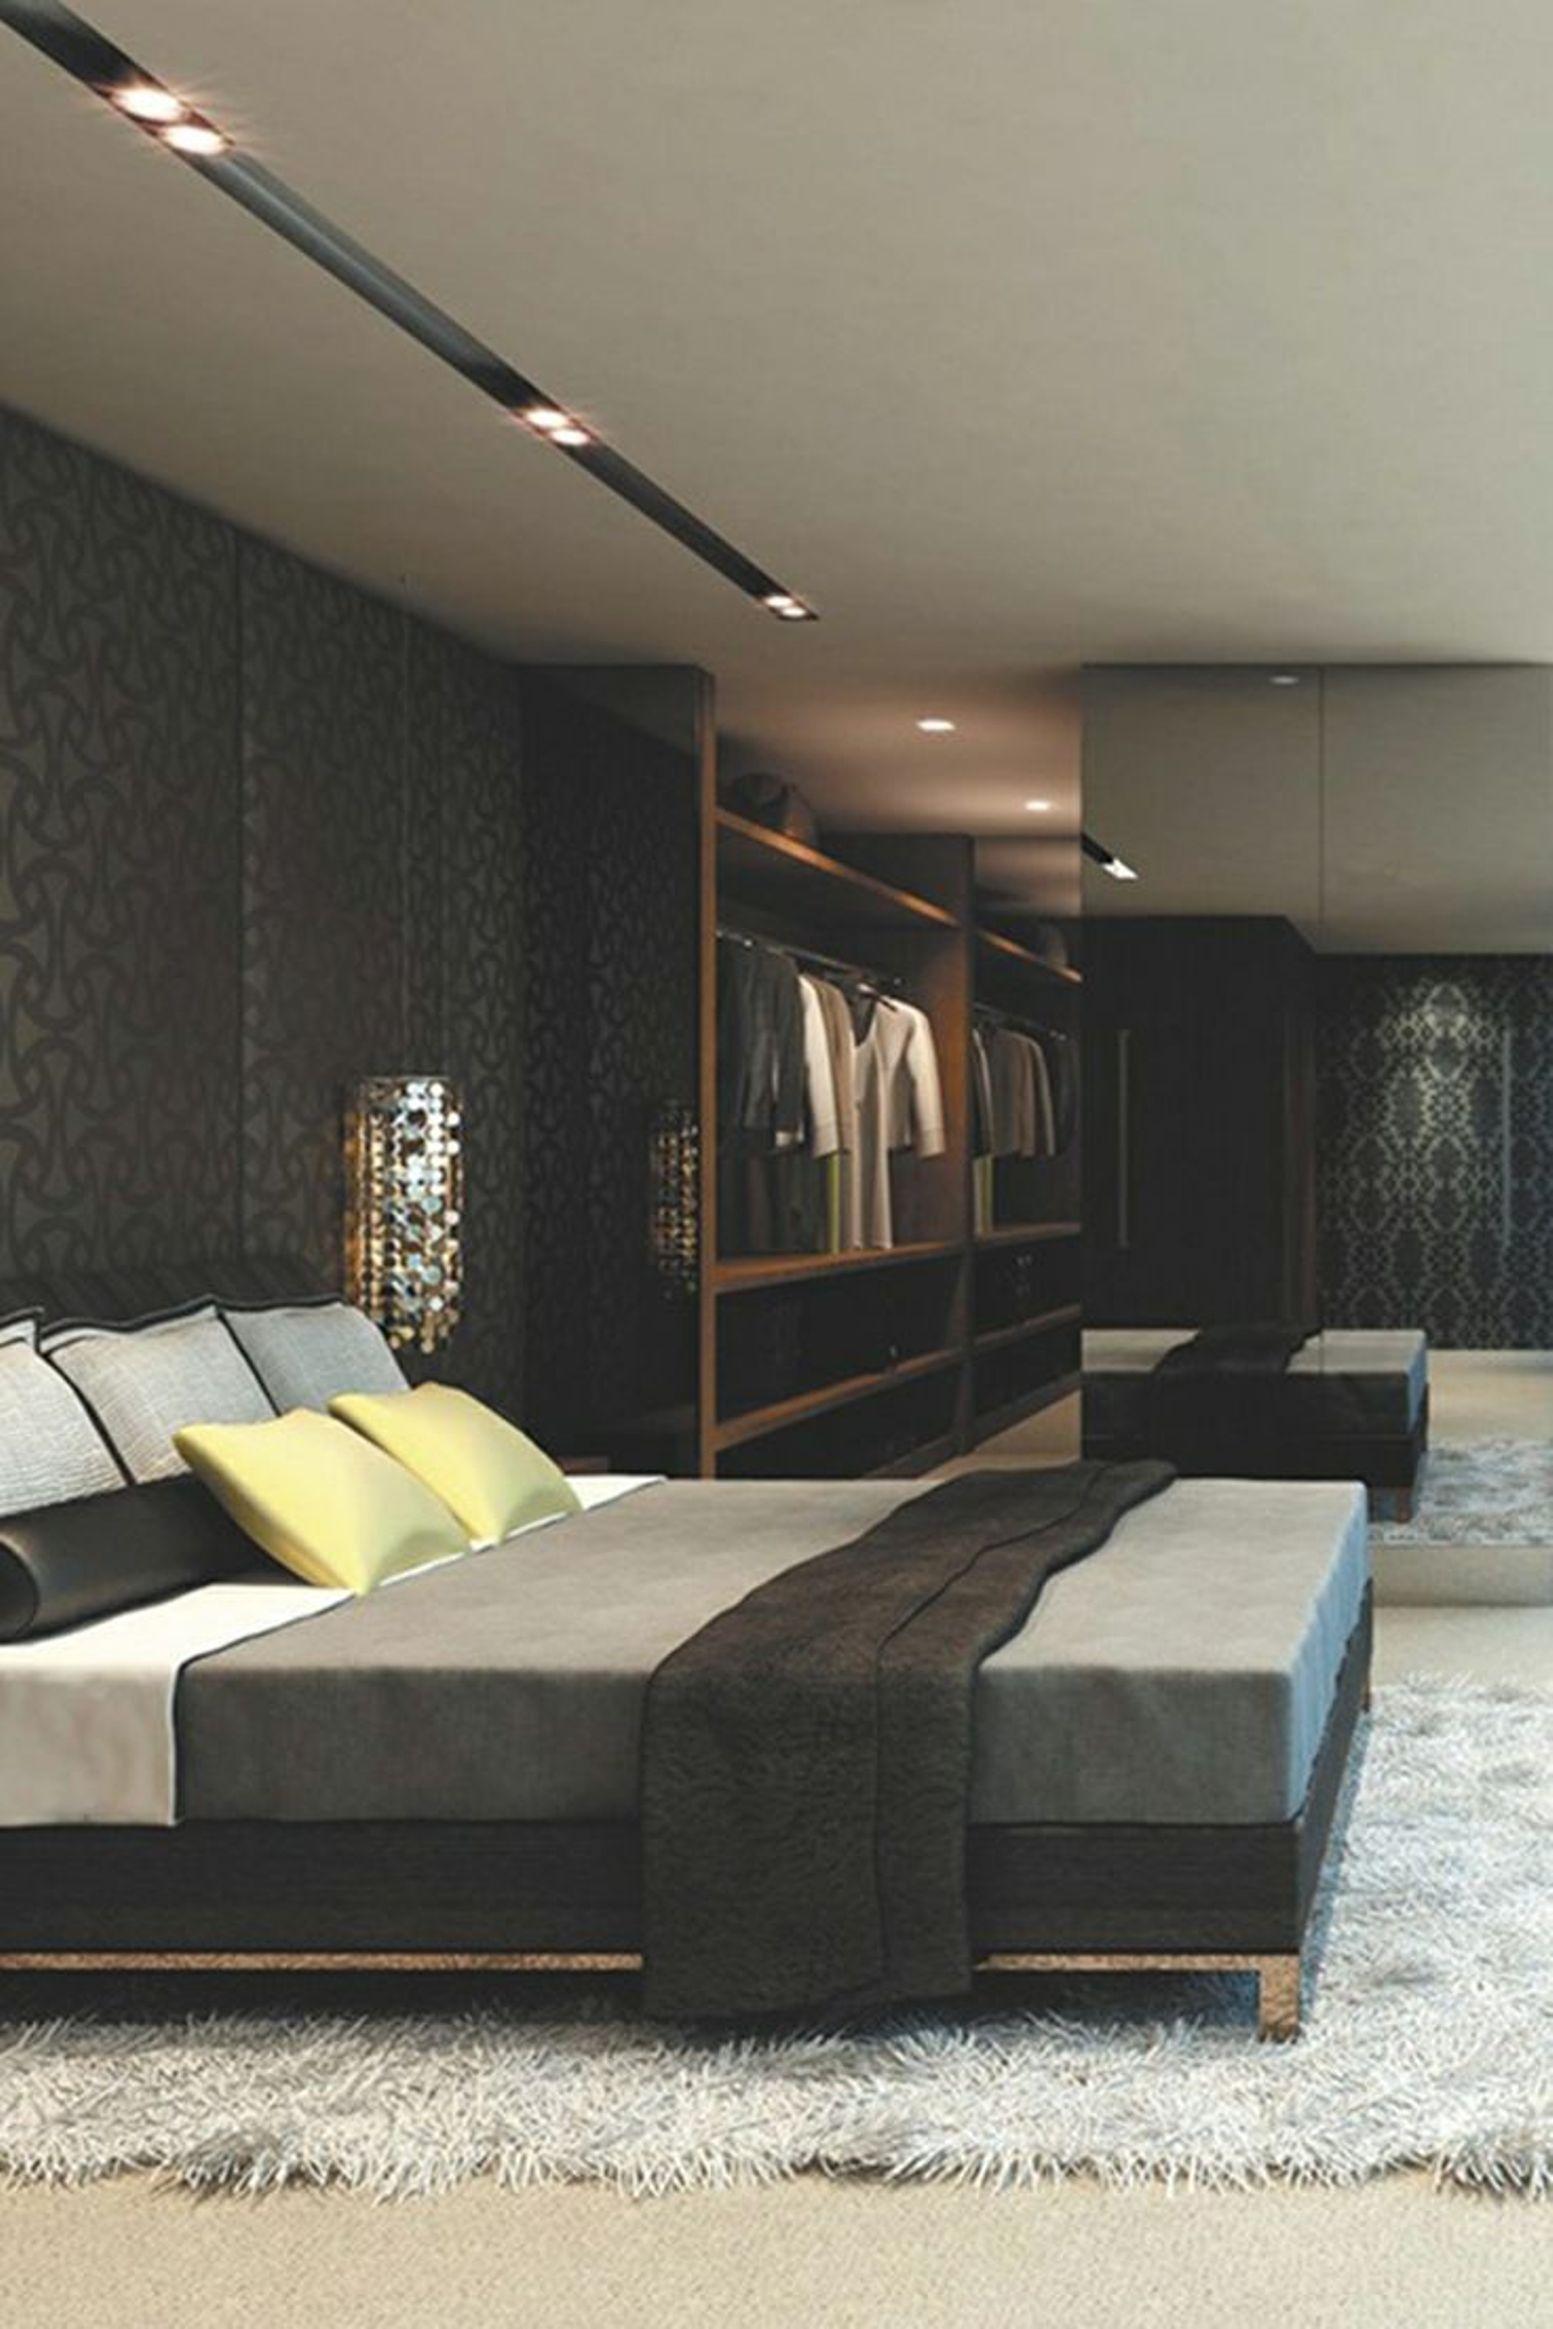 Mens Bedrooms Ideas bedroom , masculine mens bedroom ideas : modern mens bedroom ideas